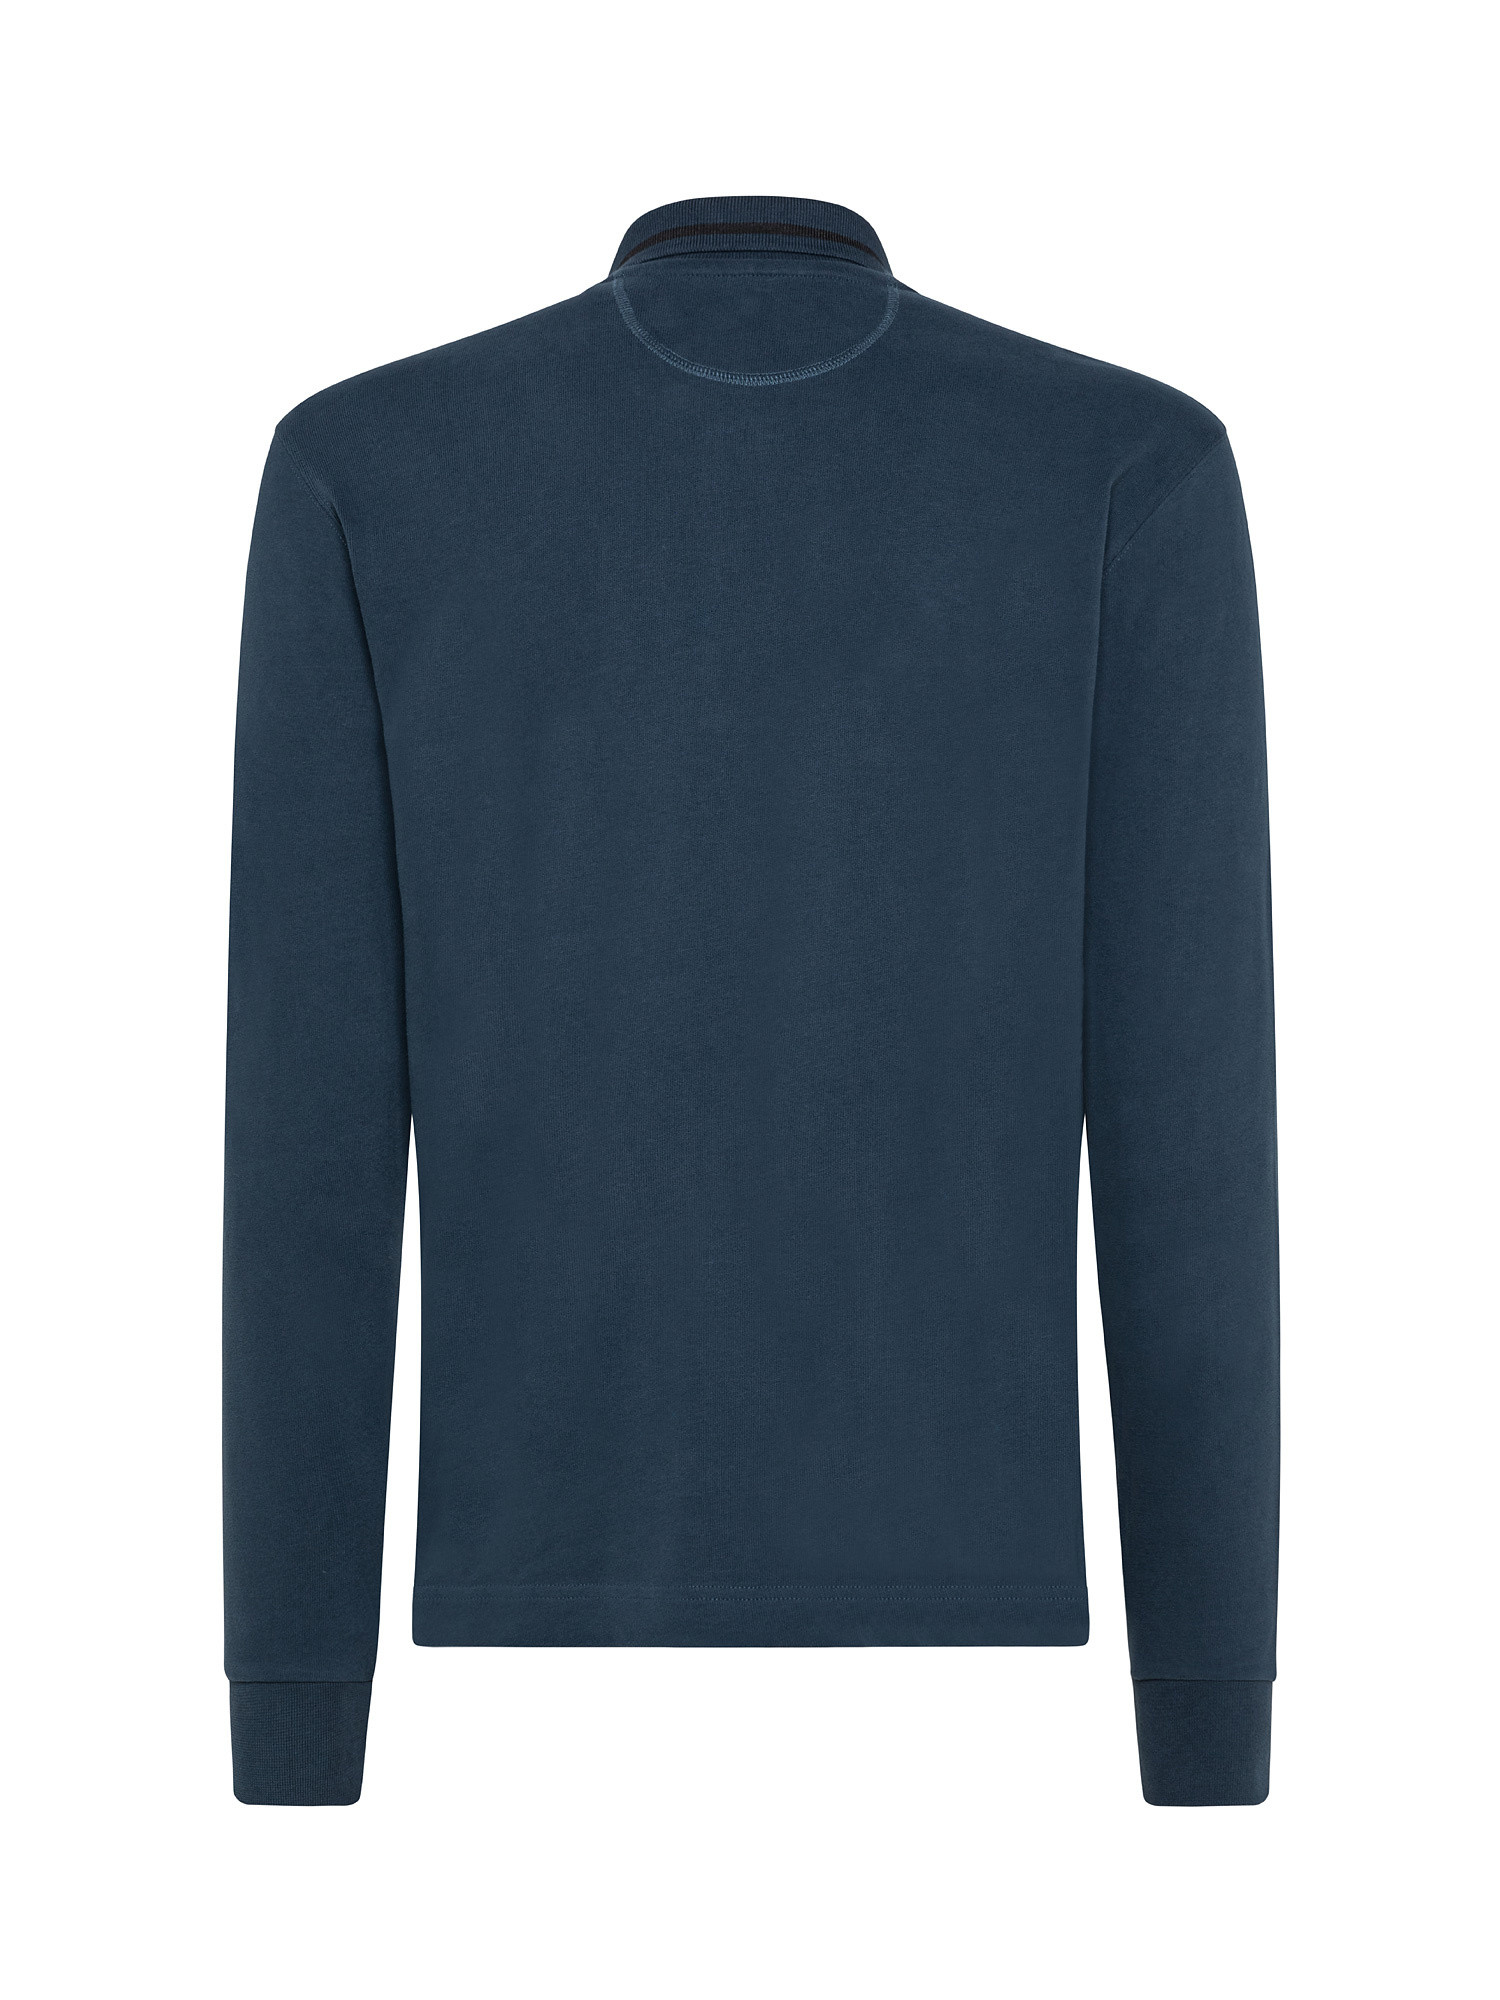 Polo uomo a maniche lunghe in cotone, Blu, large image number 1